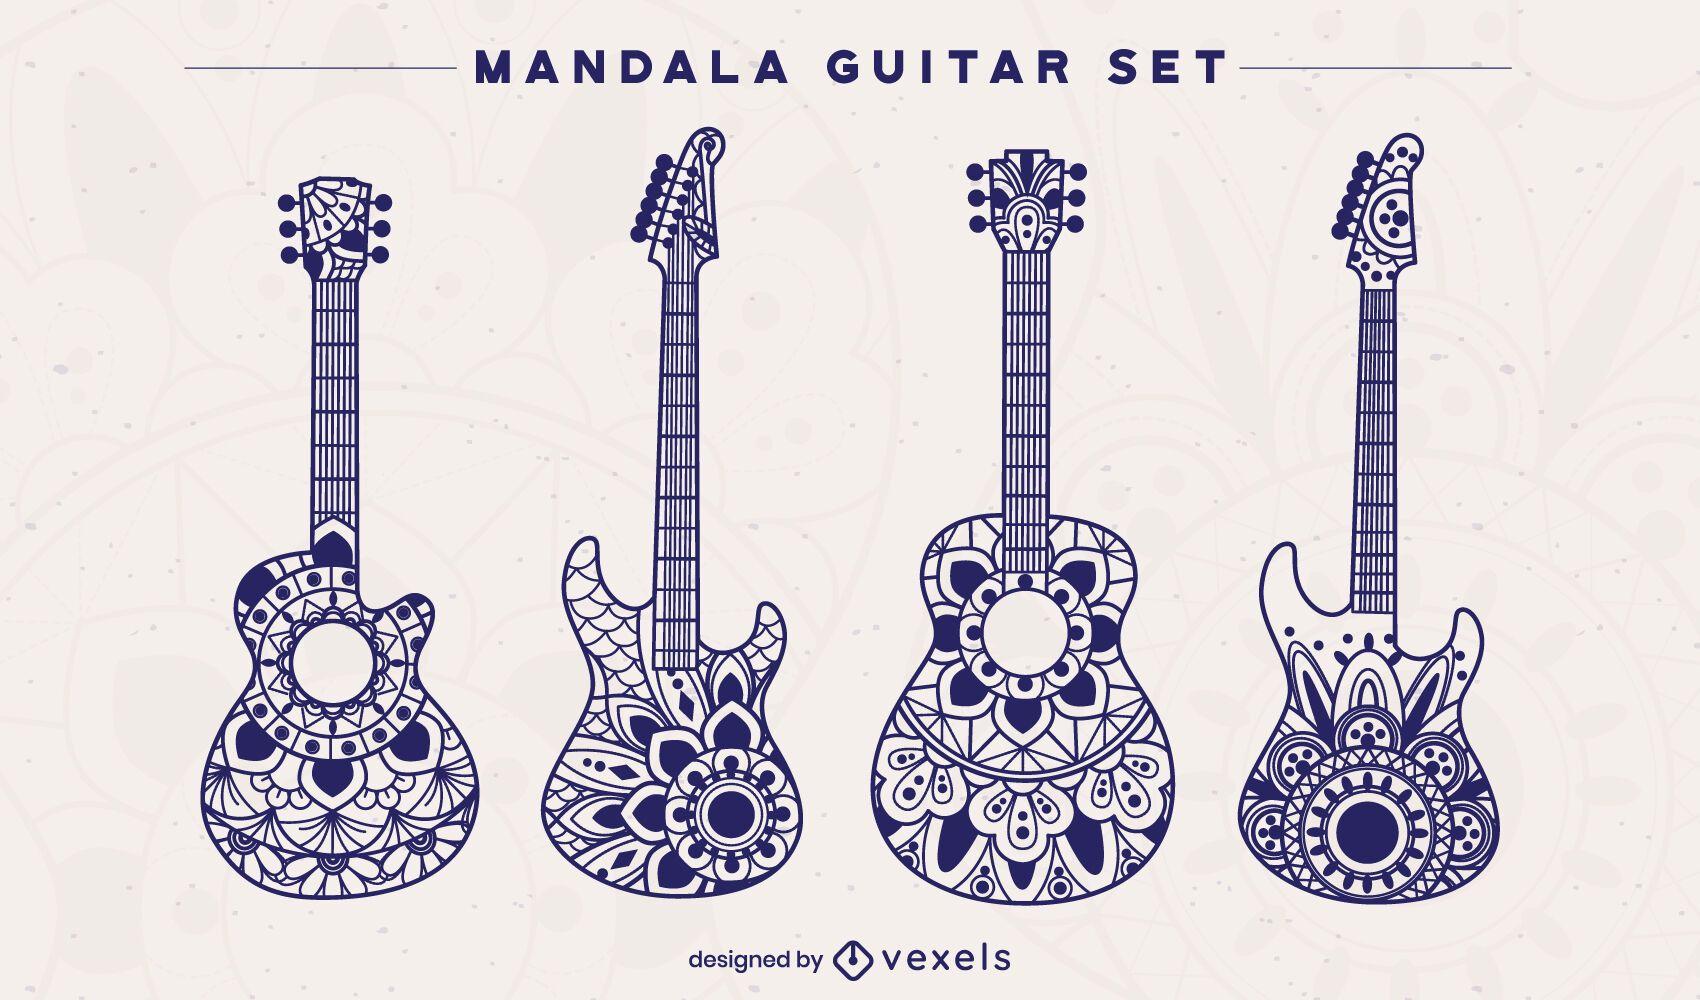 Mandala guitar set